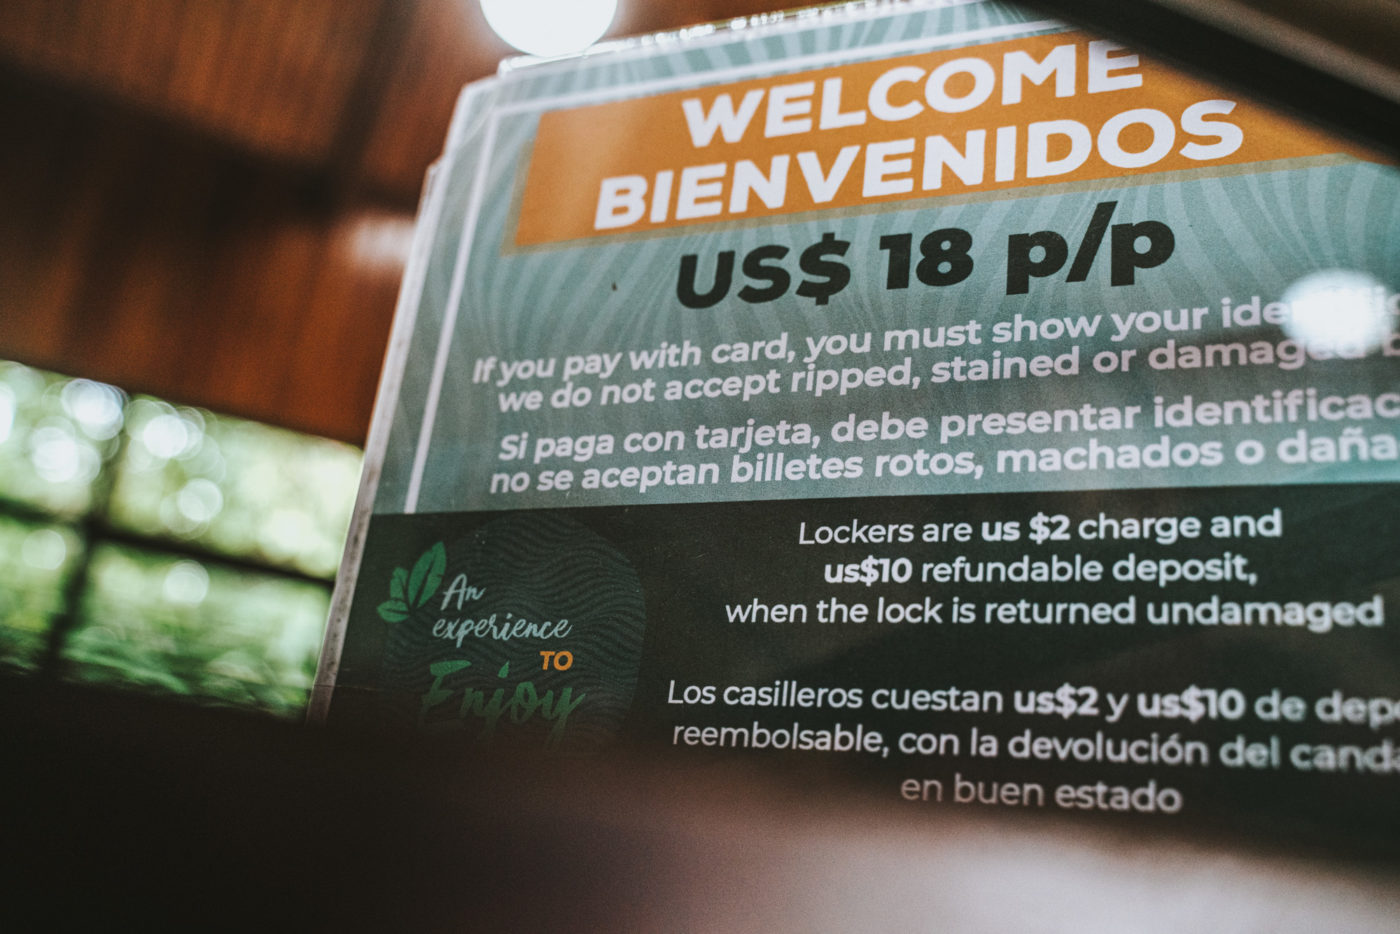 Things to do in La Fortuna, Costa Rica: Travel to La Fortuna Waterfall